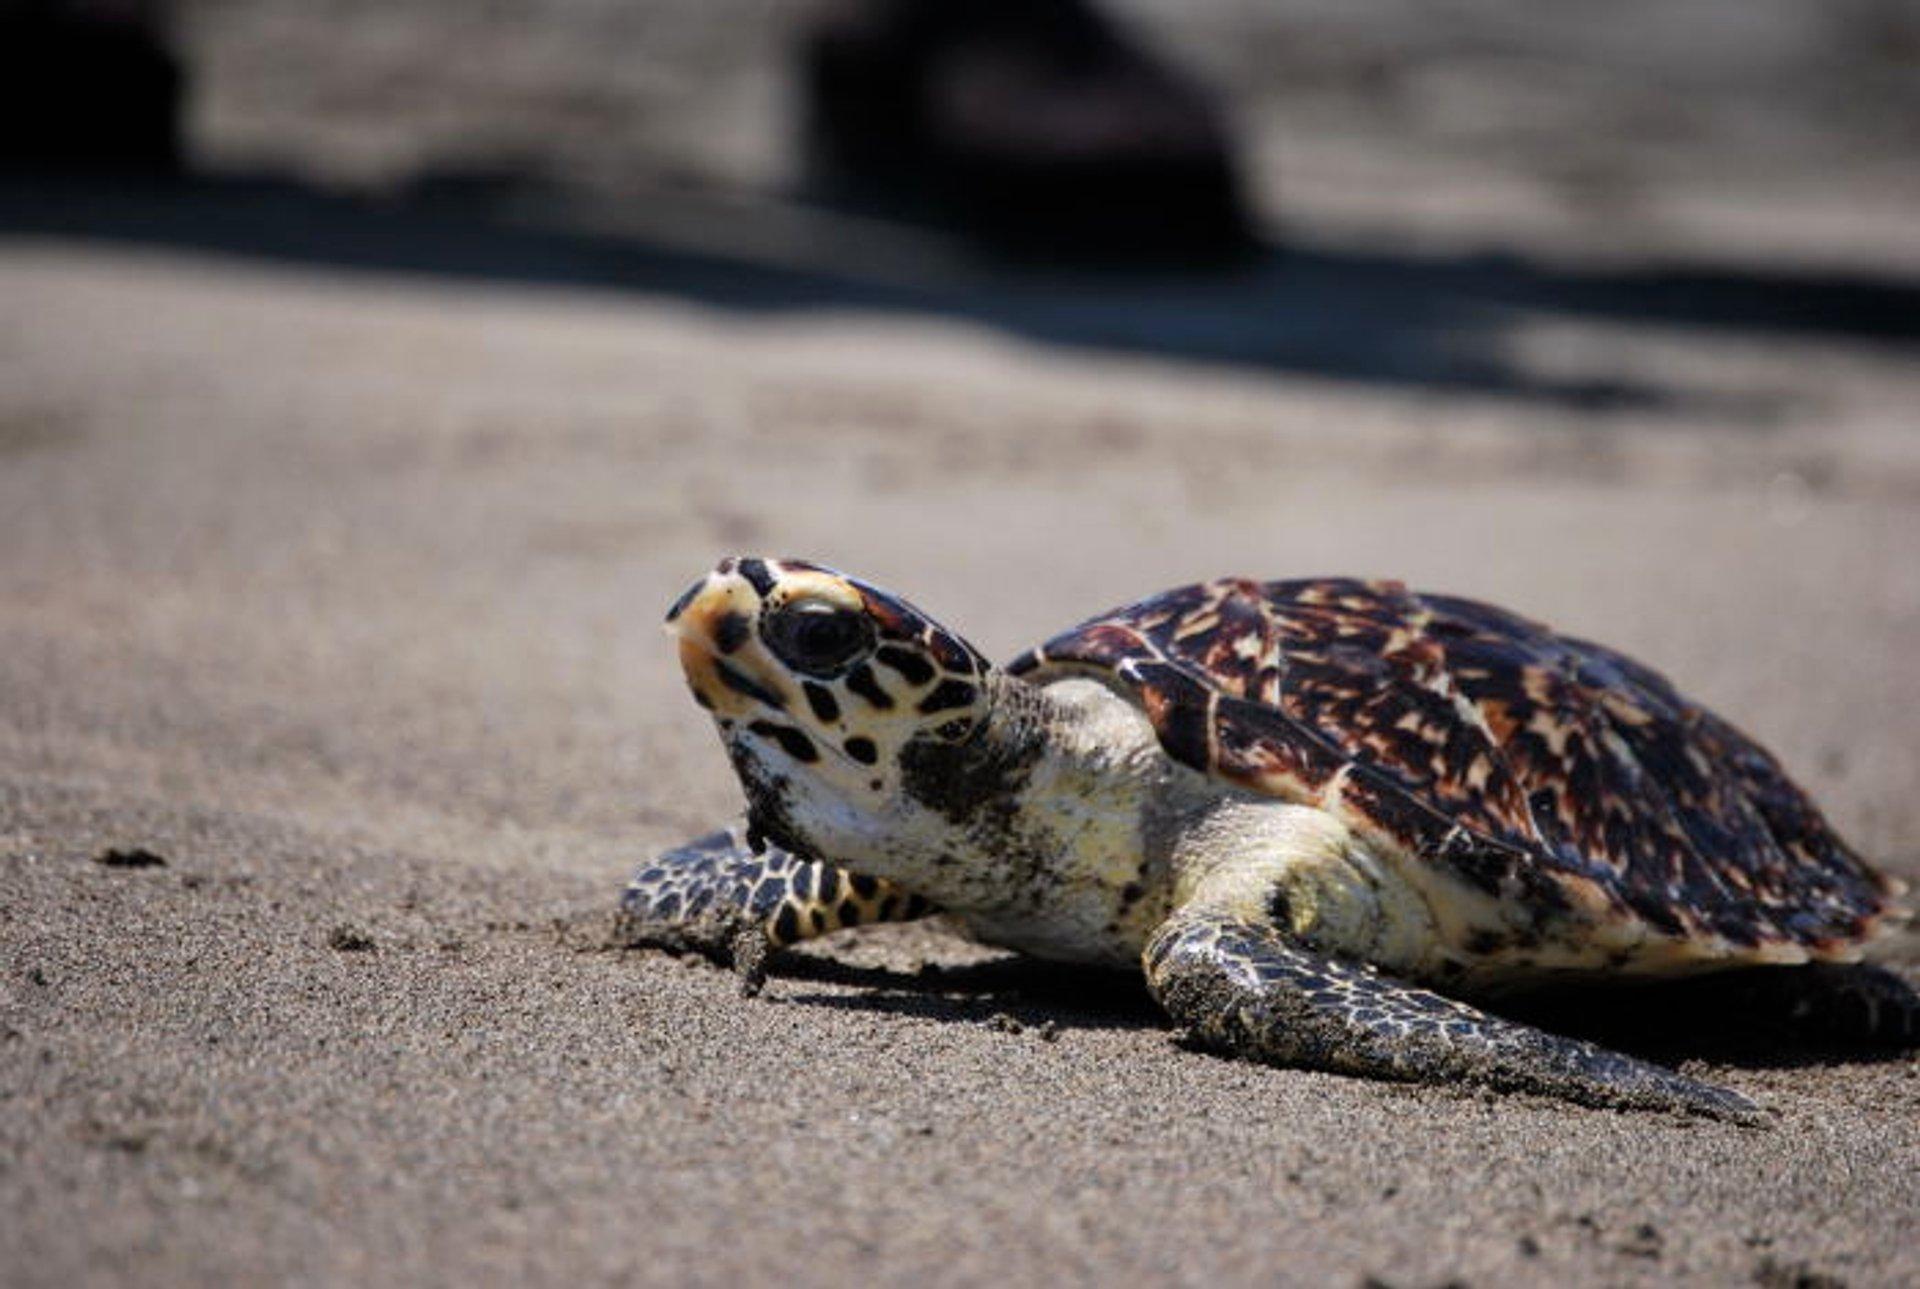 Hawksbill Turtles in Costa Rica 2019 - Best Time